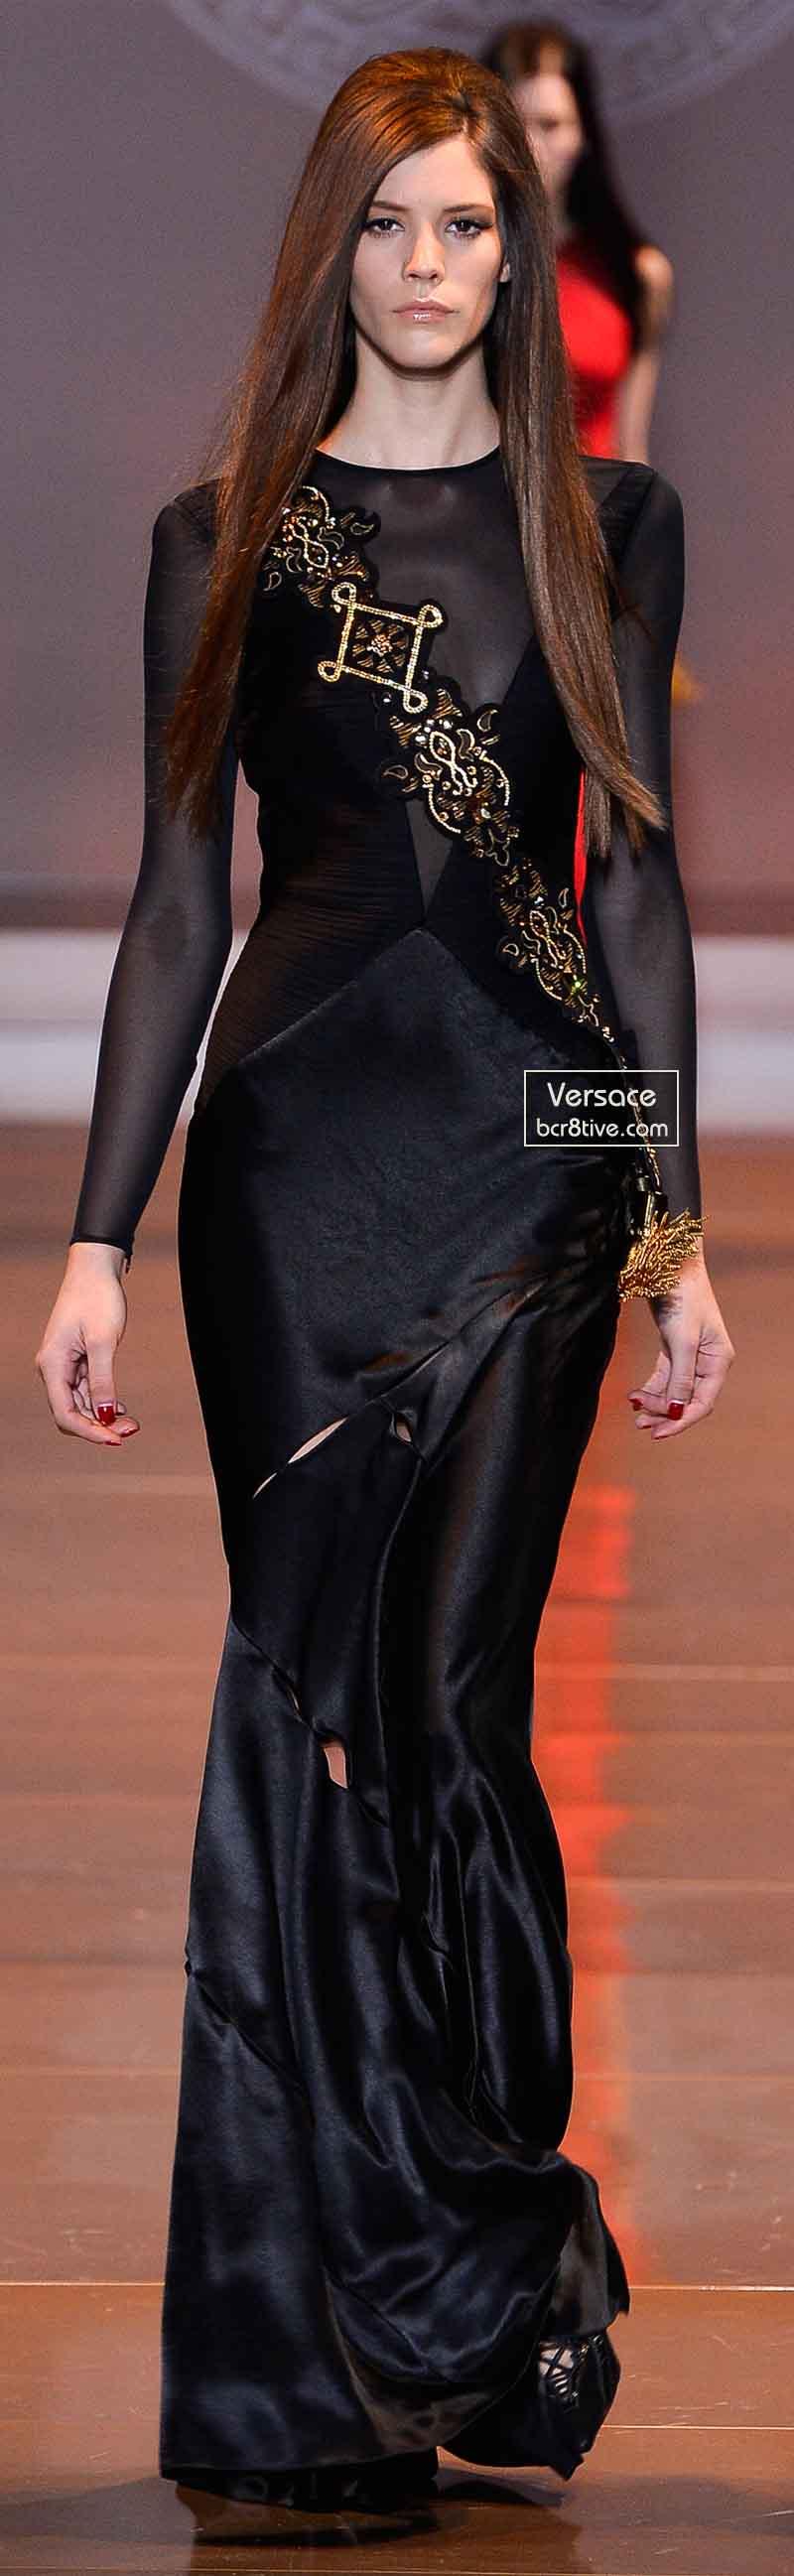 Versace Fall 2014 - Carla Ciffoni